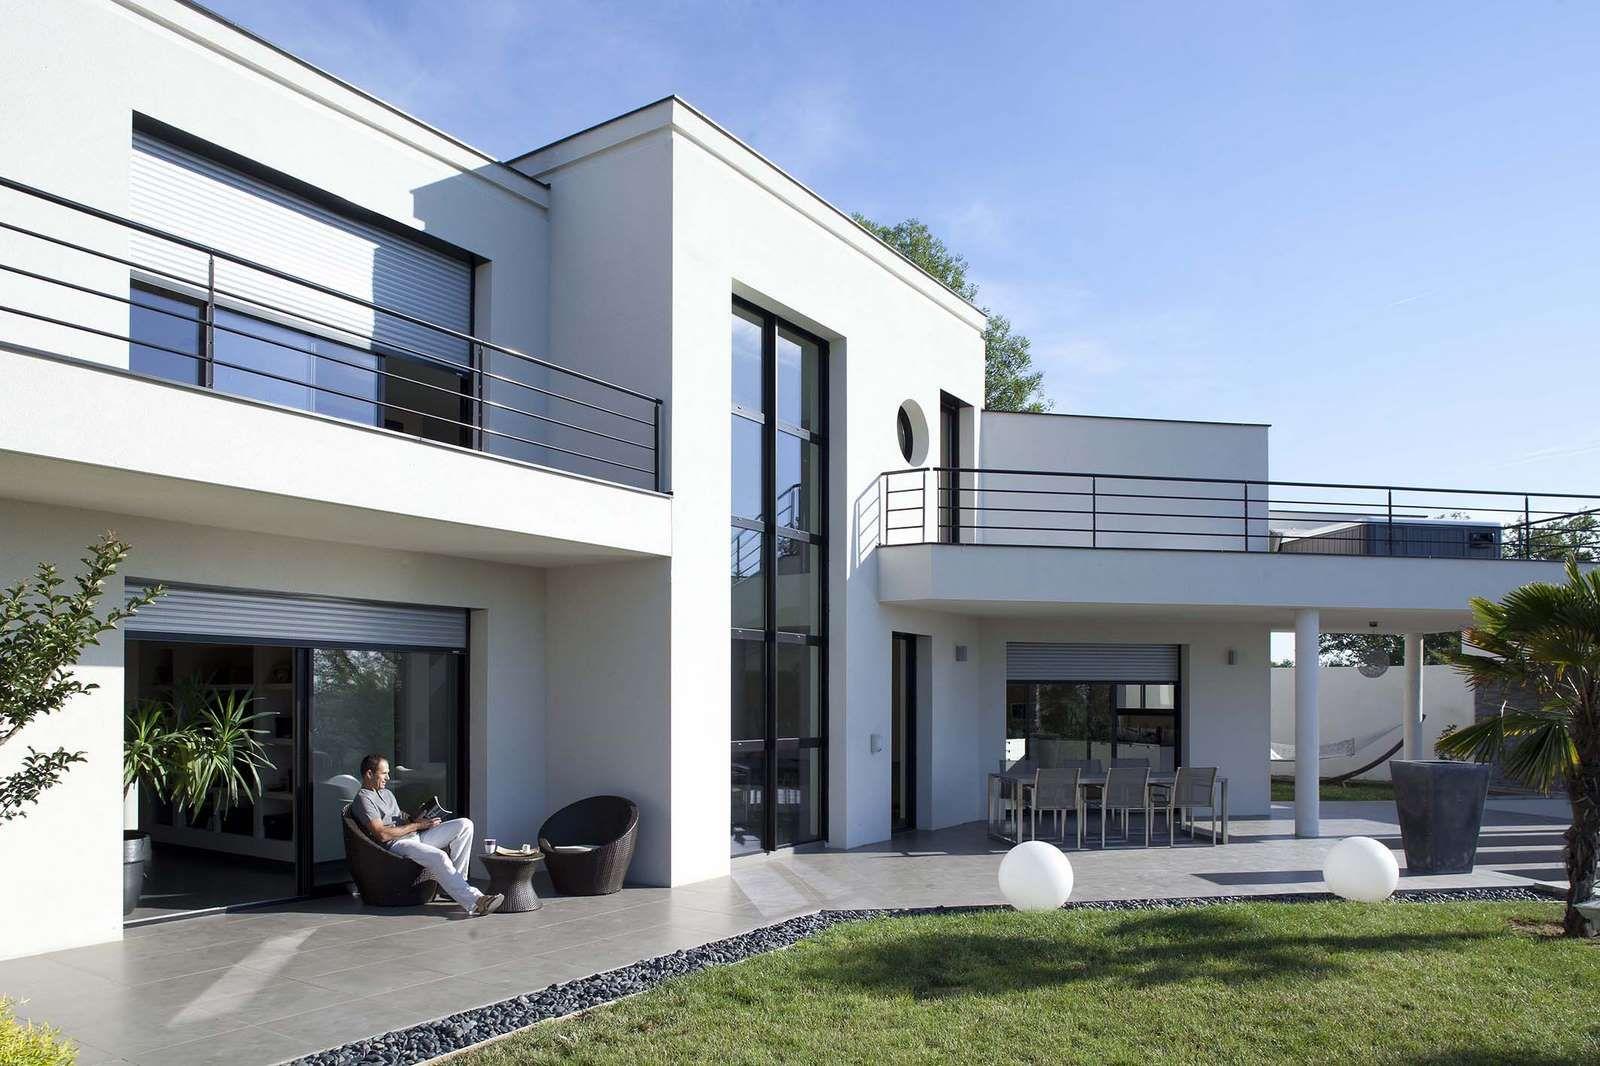 Epic Bauhaus Flachdachhaus Bilder Referenzen NURDA Hausbau Hannover BG Bauhaus Flachdachhaus Fassaden Pinterest Flachdachhaus Bauhaus und Hausbau